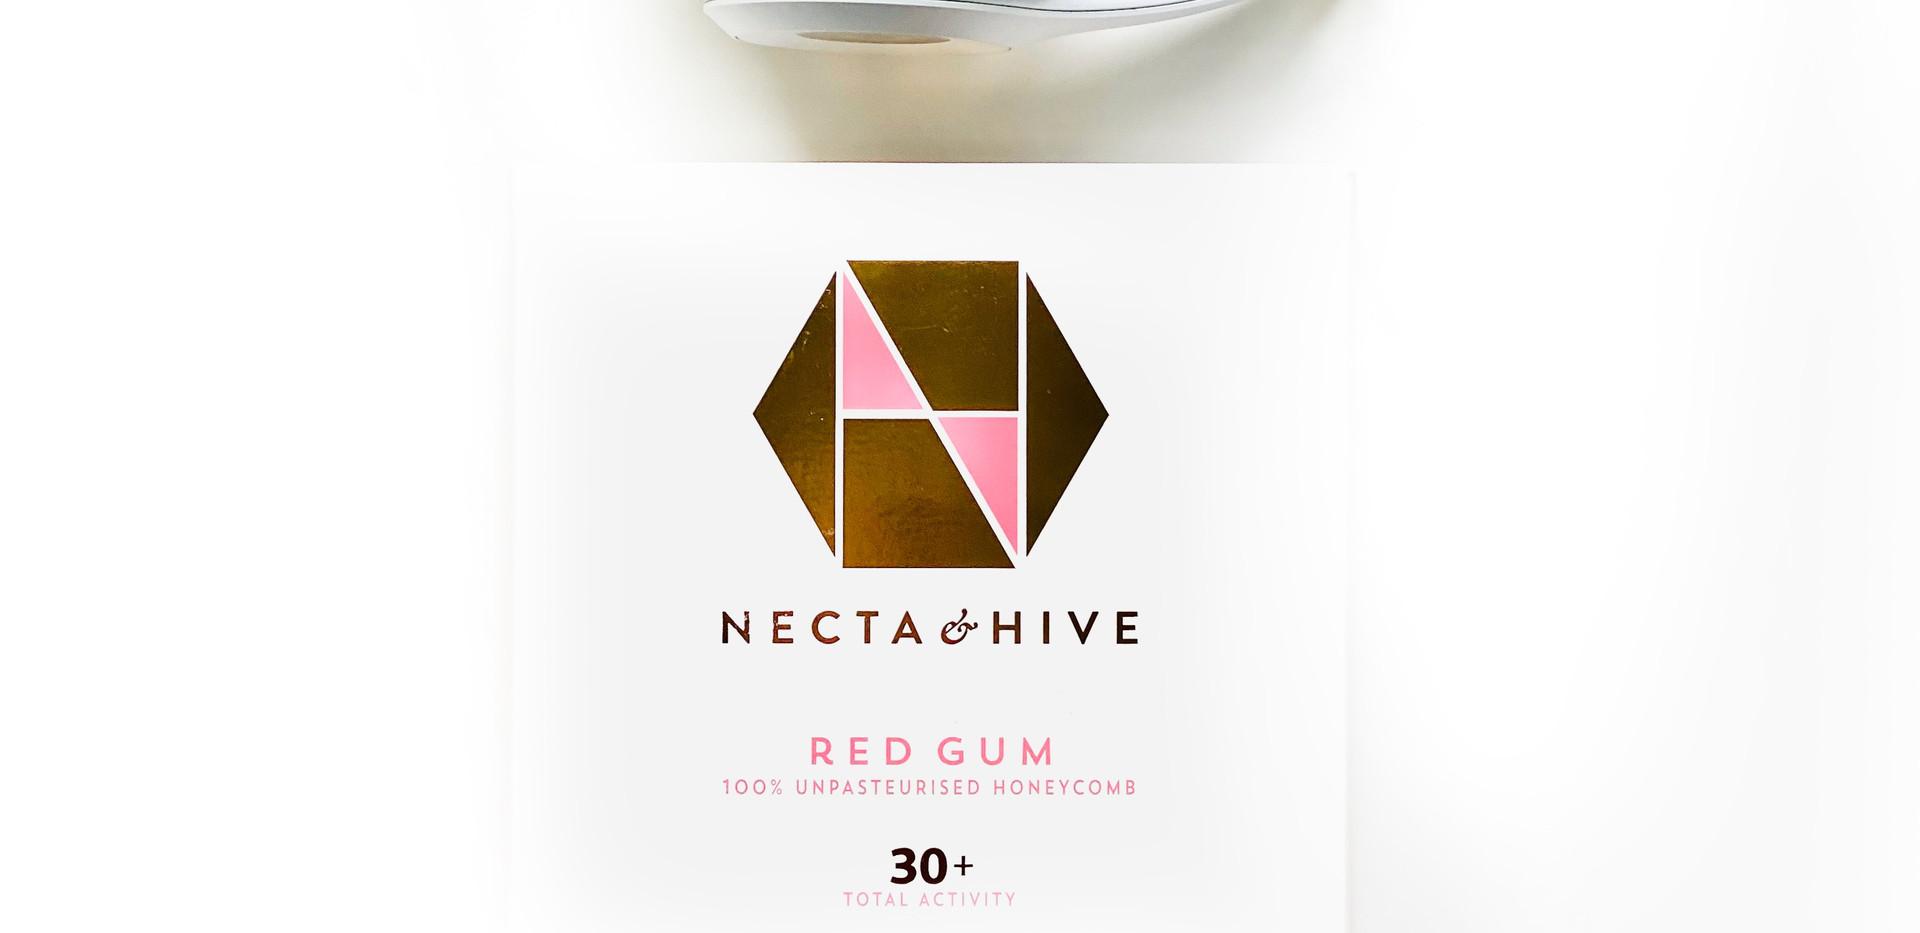 Necta & Hive